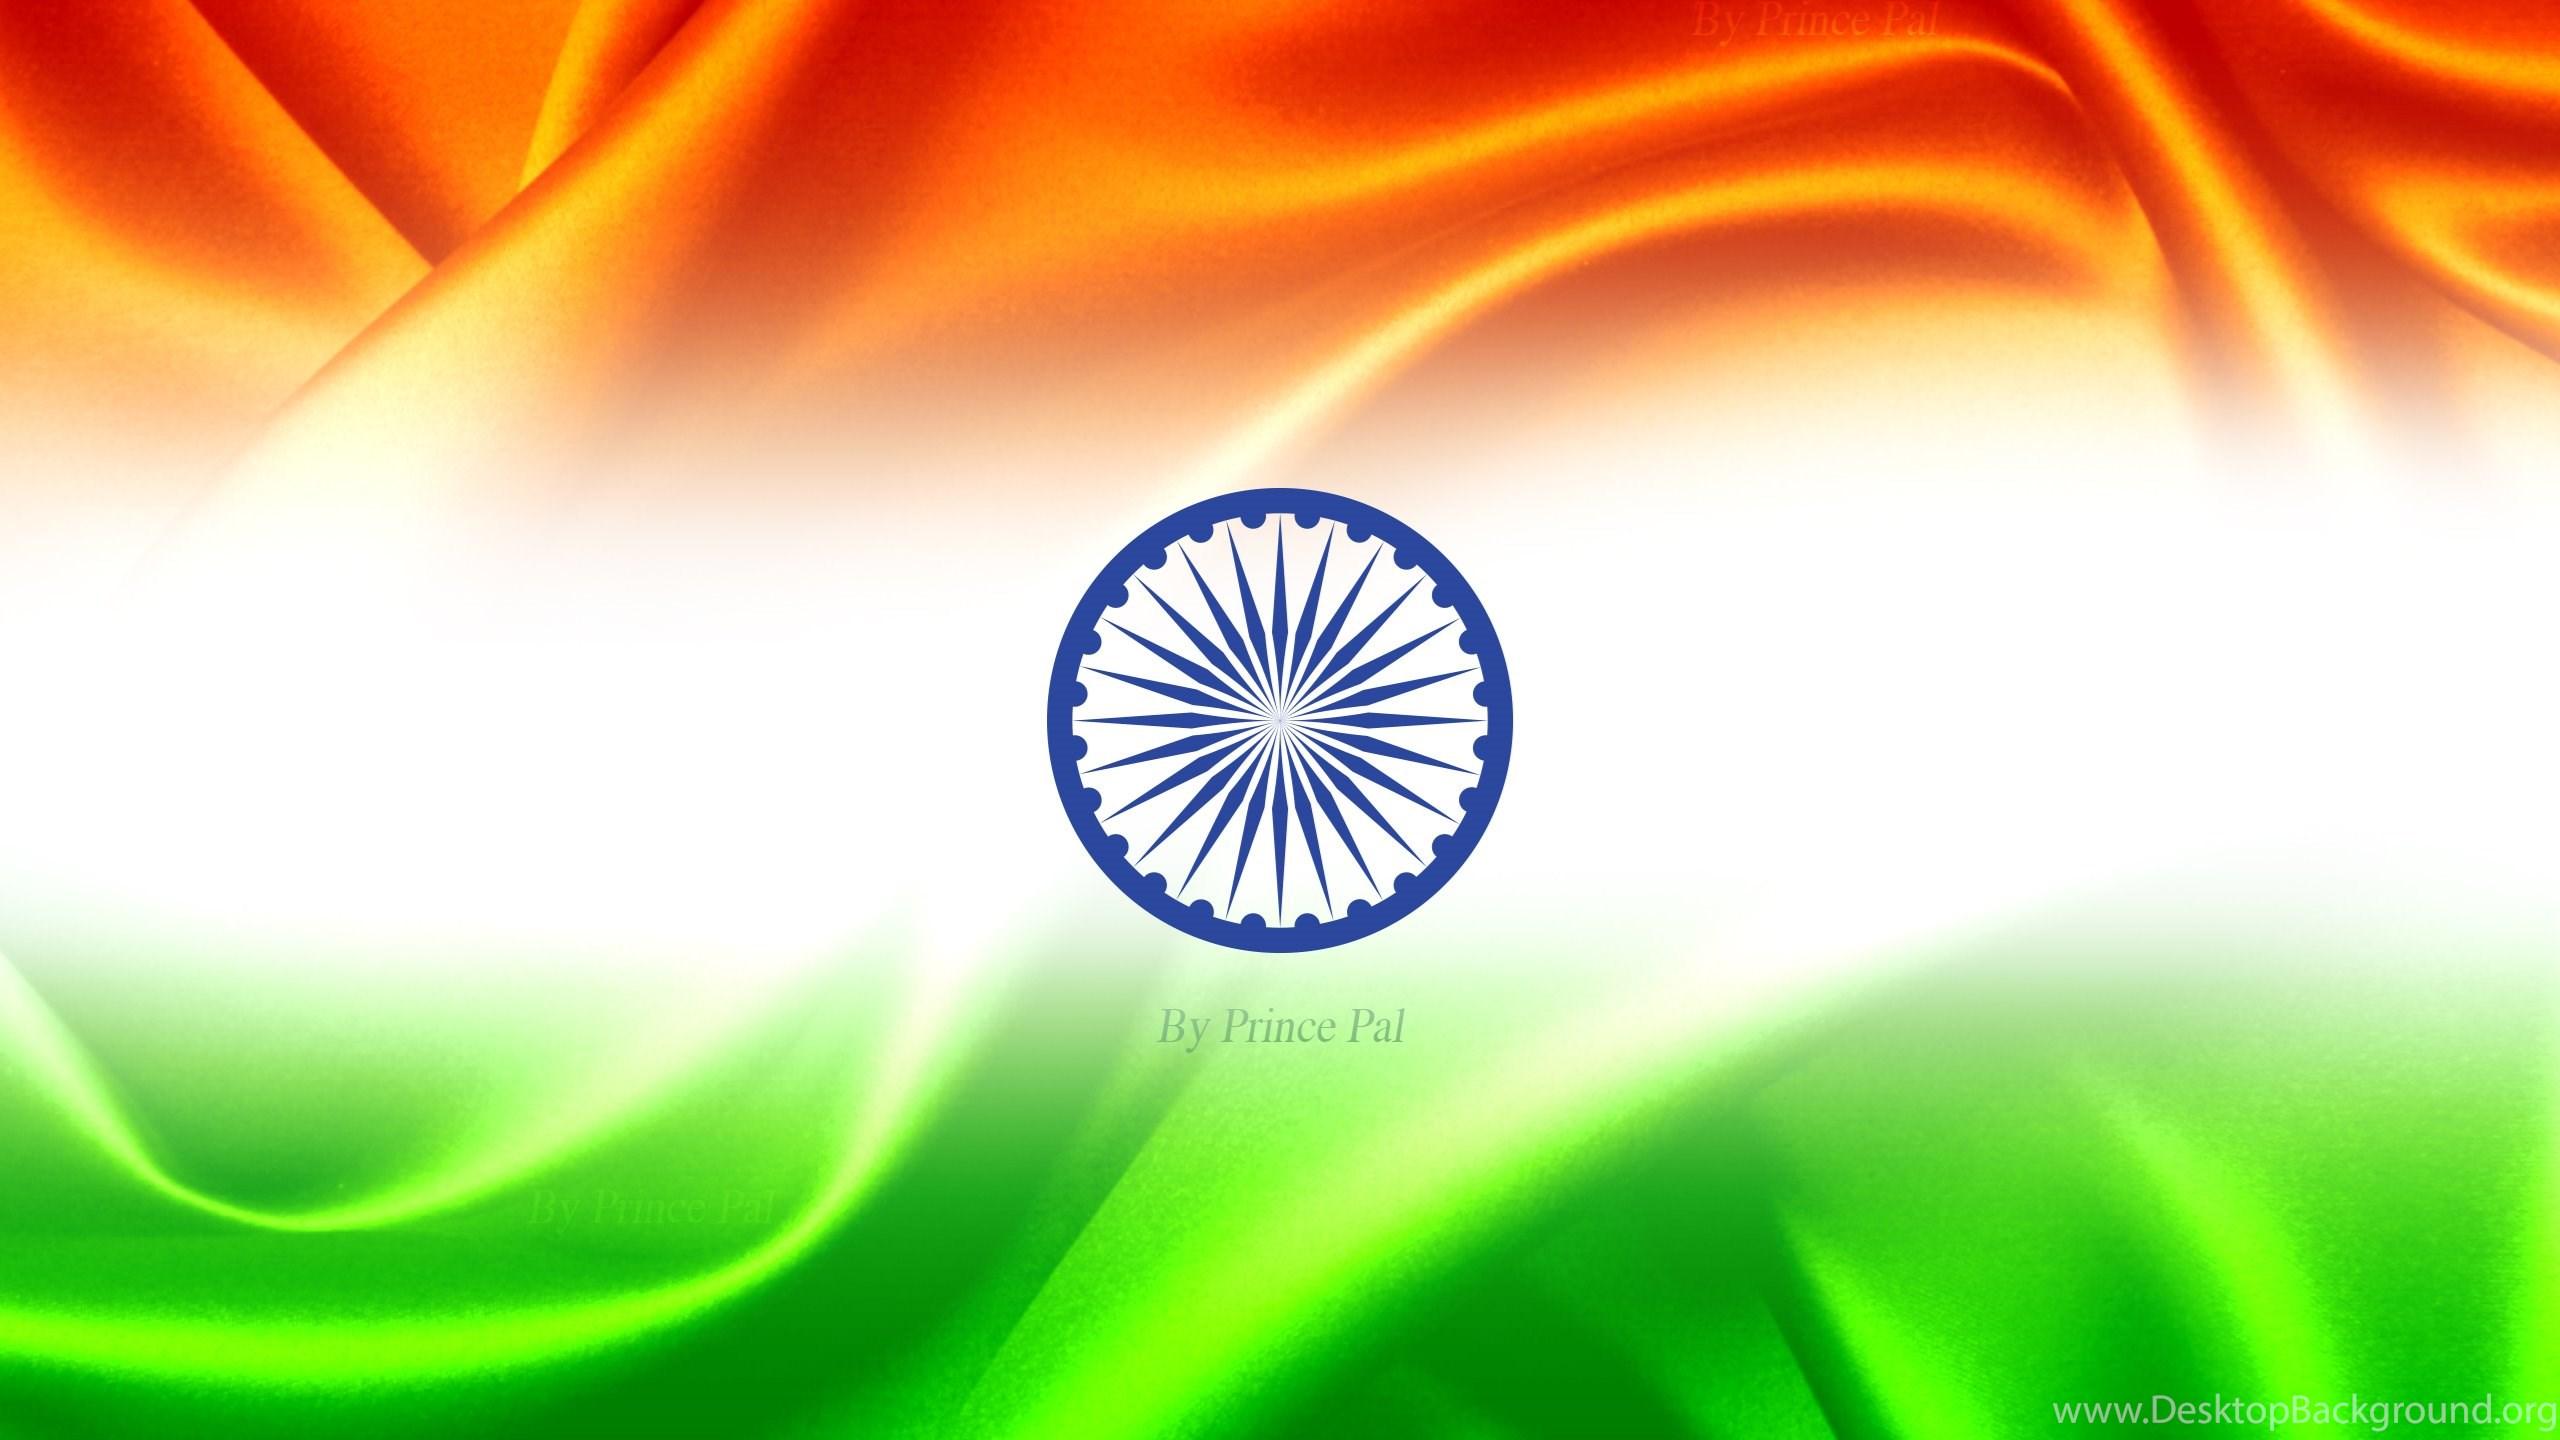 Hd indian flag wallpapers desktop background netbook voltagebd Choice Image